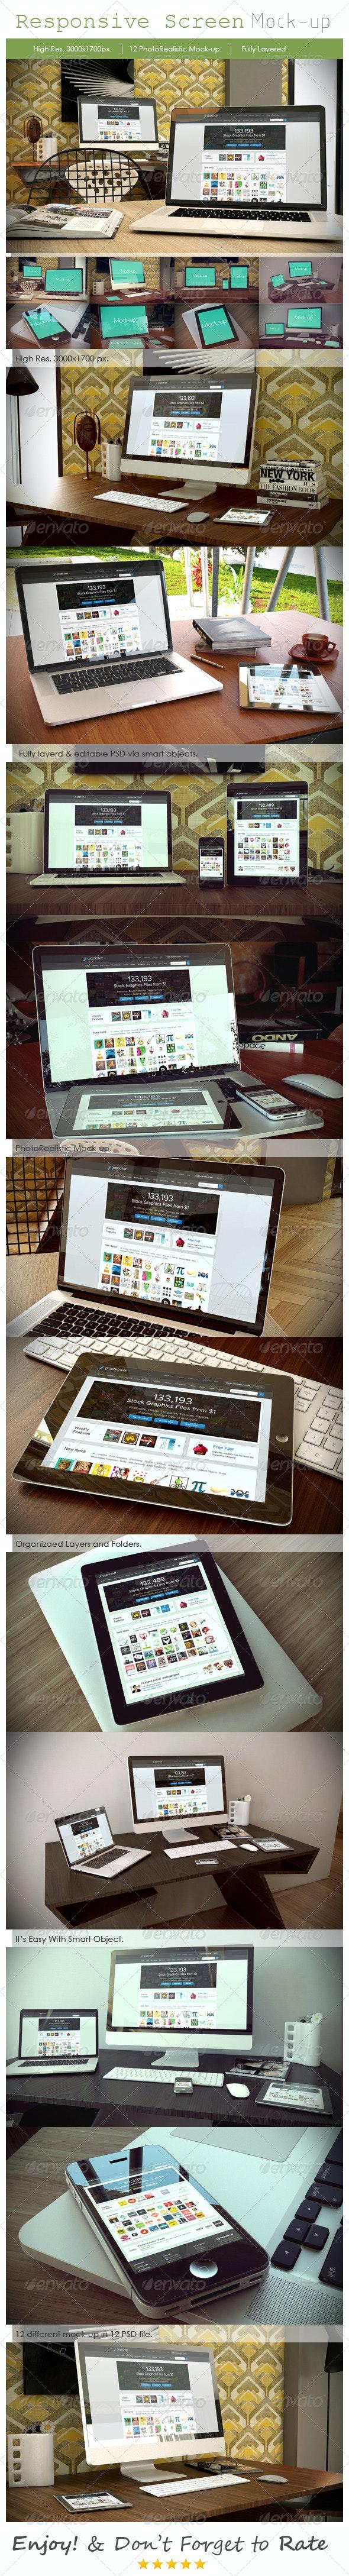 Responsive Device Mockup - Multiple Displays